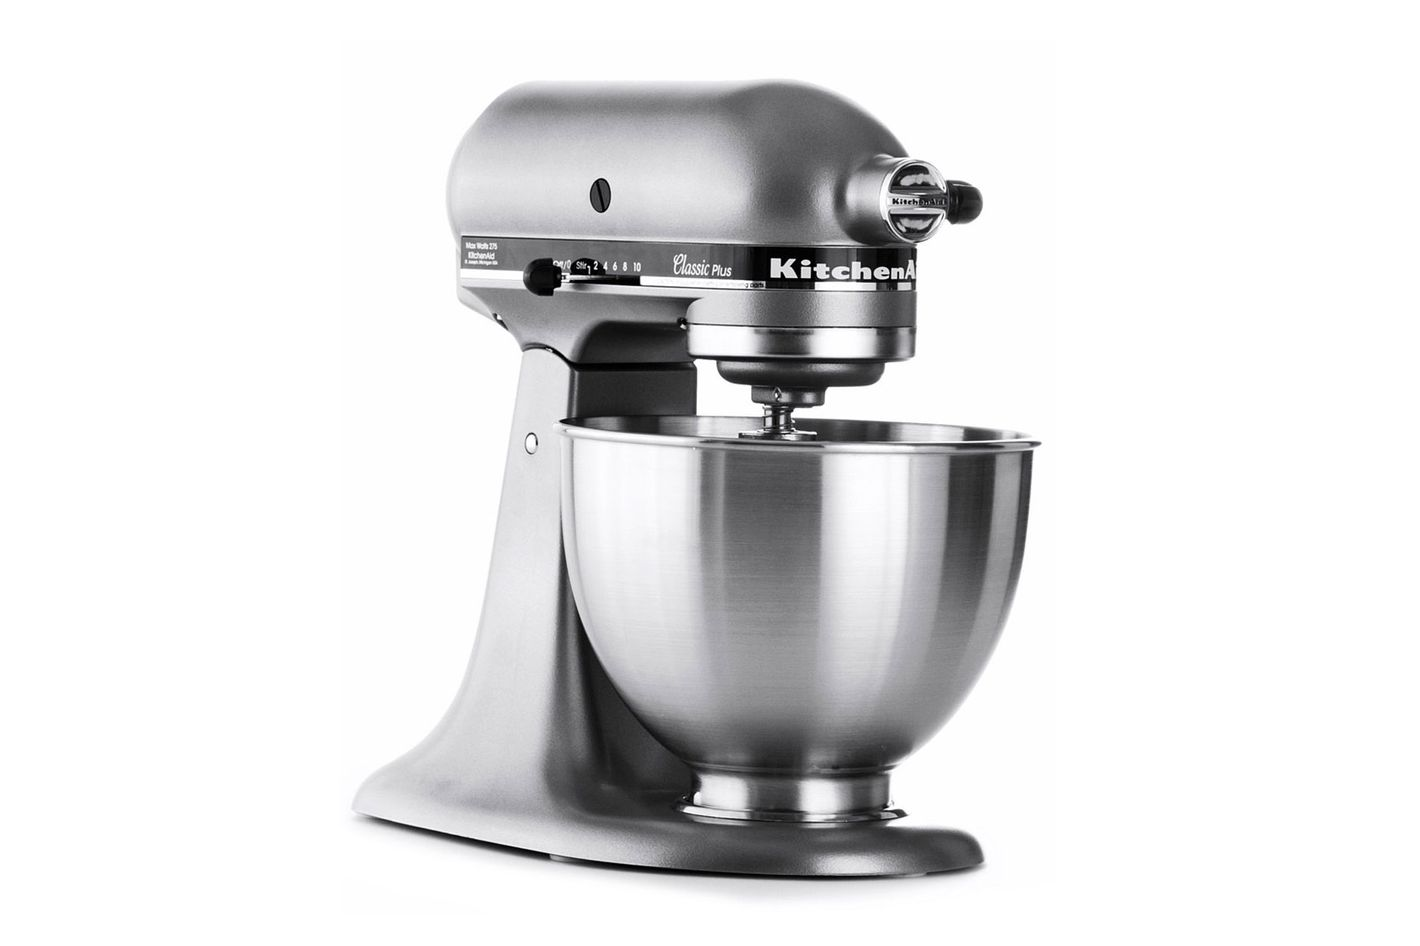 KitchenAid 4.5-Quart Classic Plus Stand Mixer